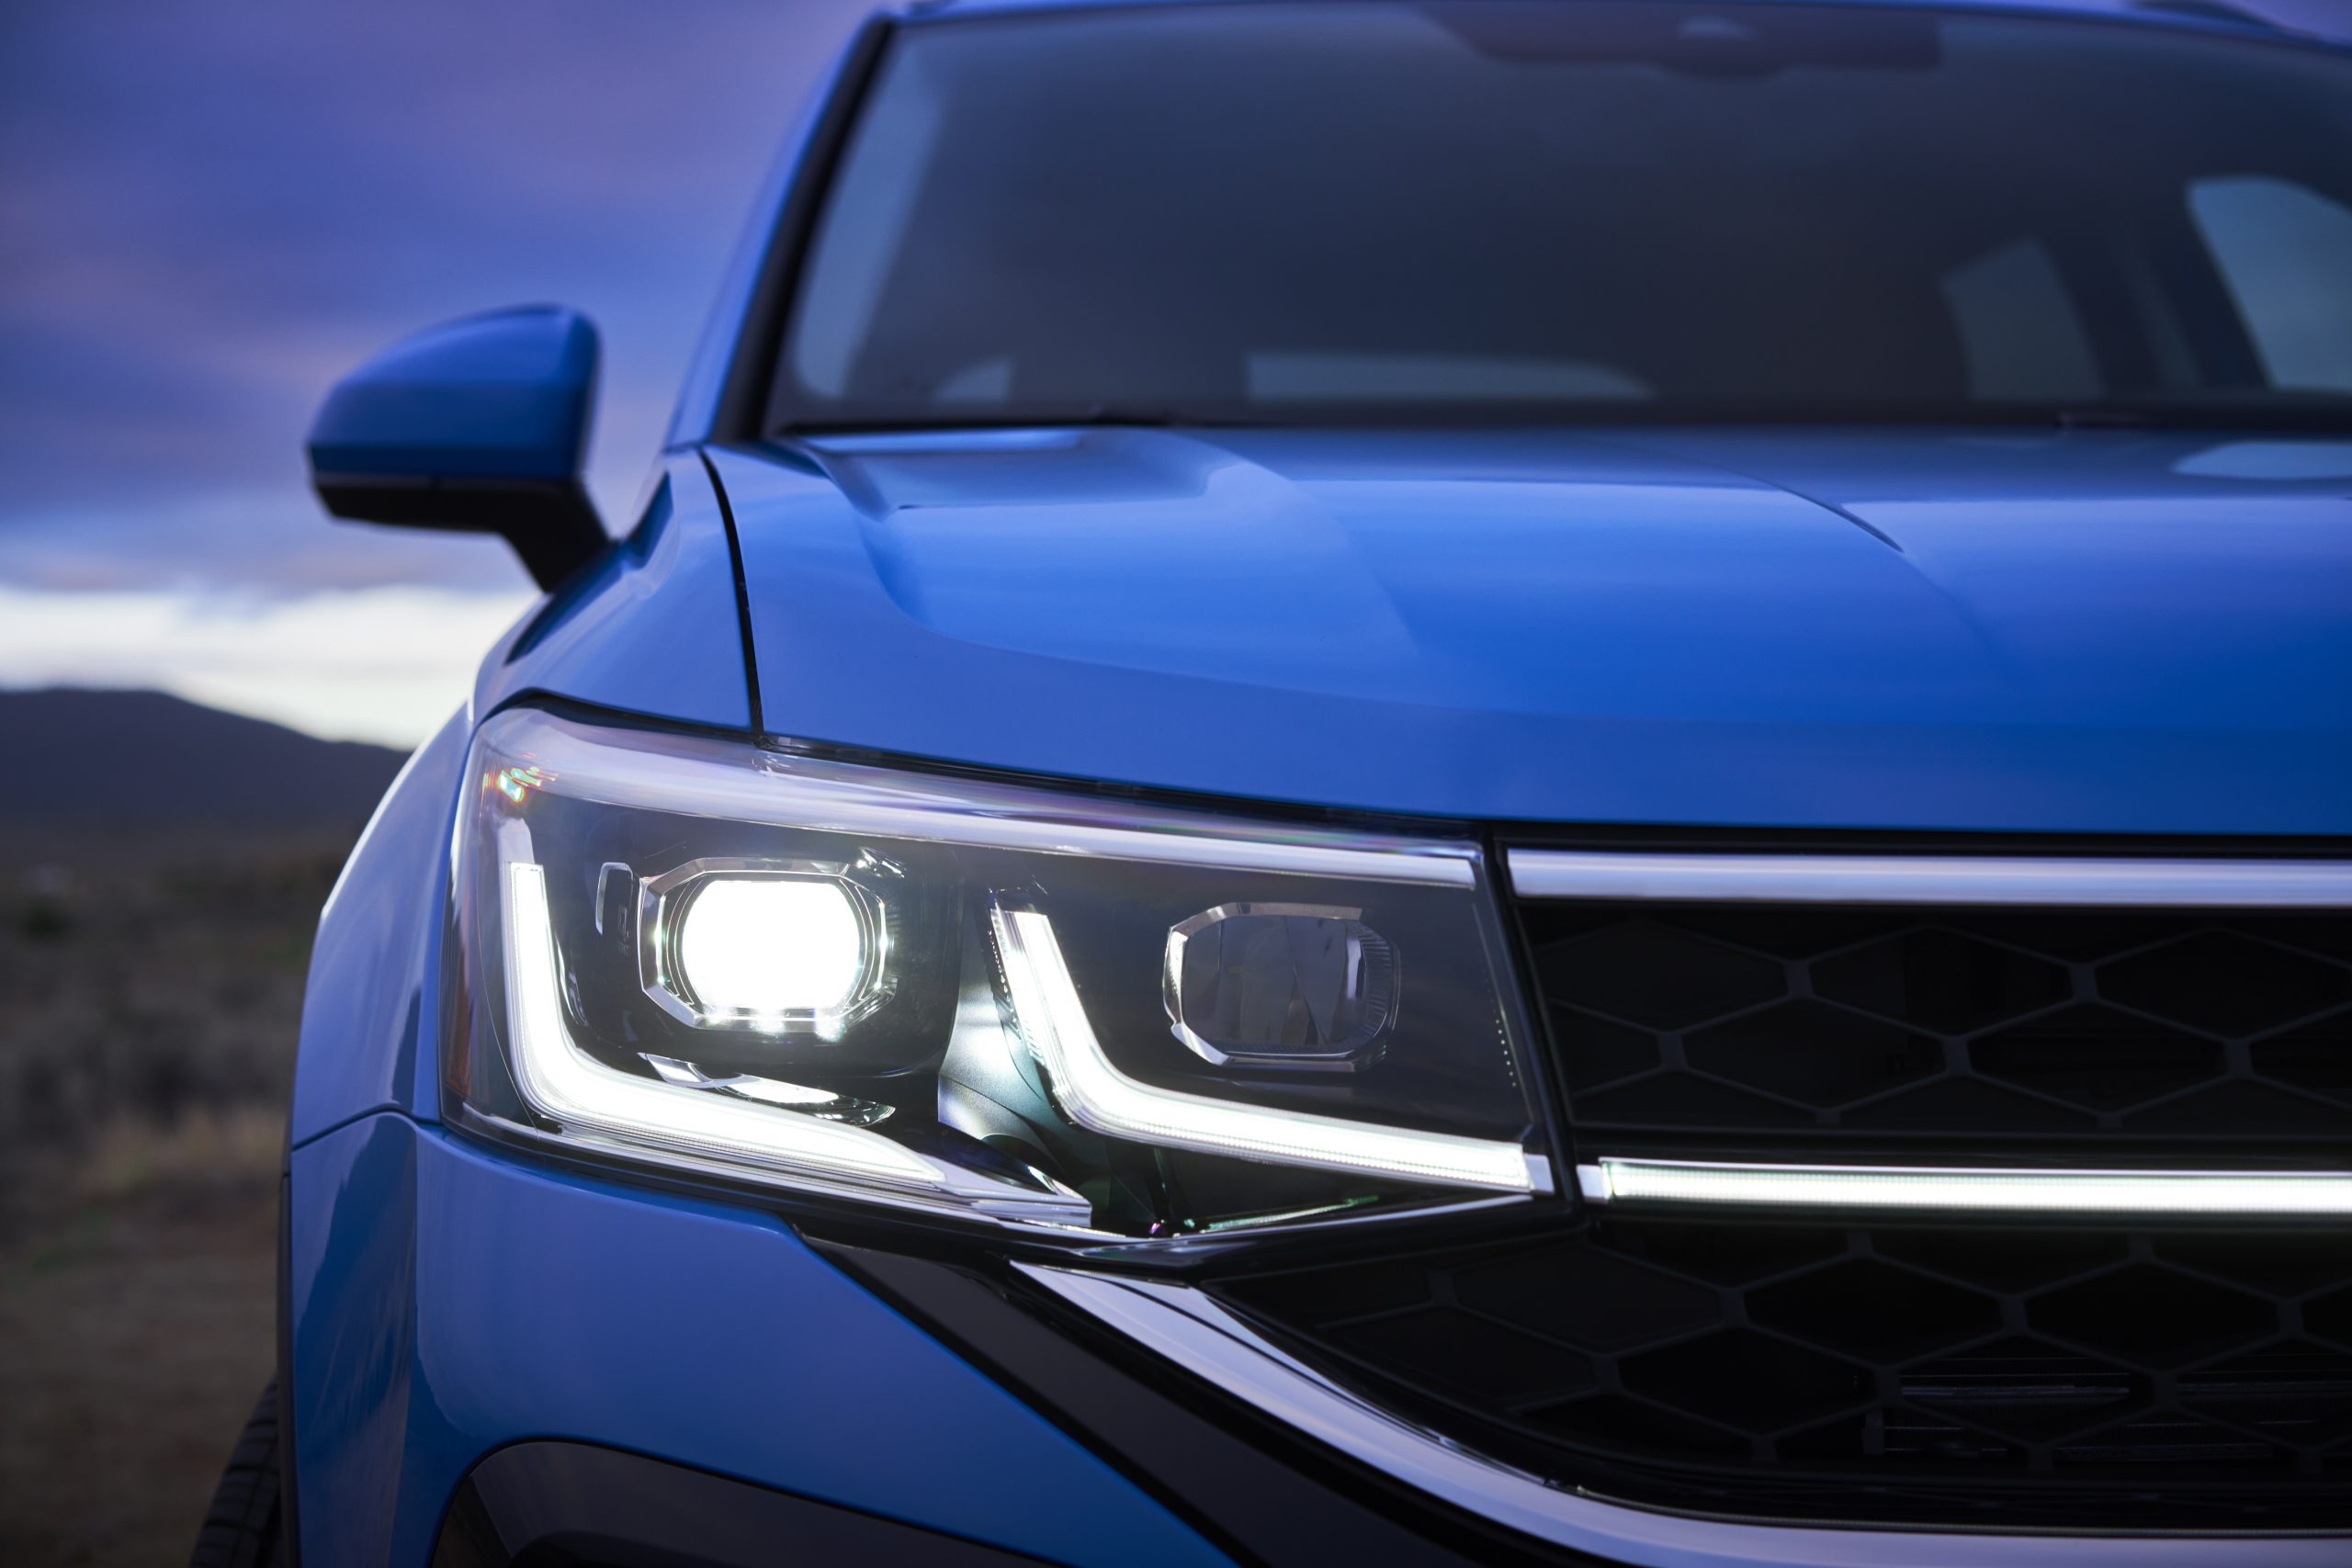 2022 Volkswagen Taos head lamp detail